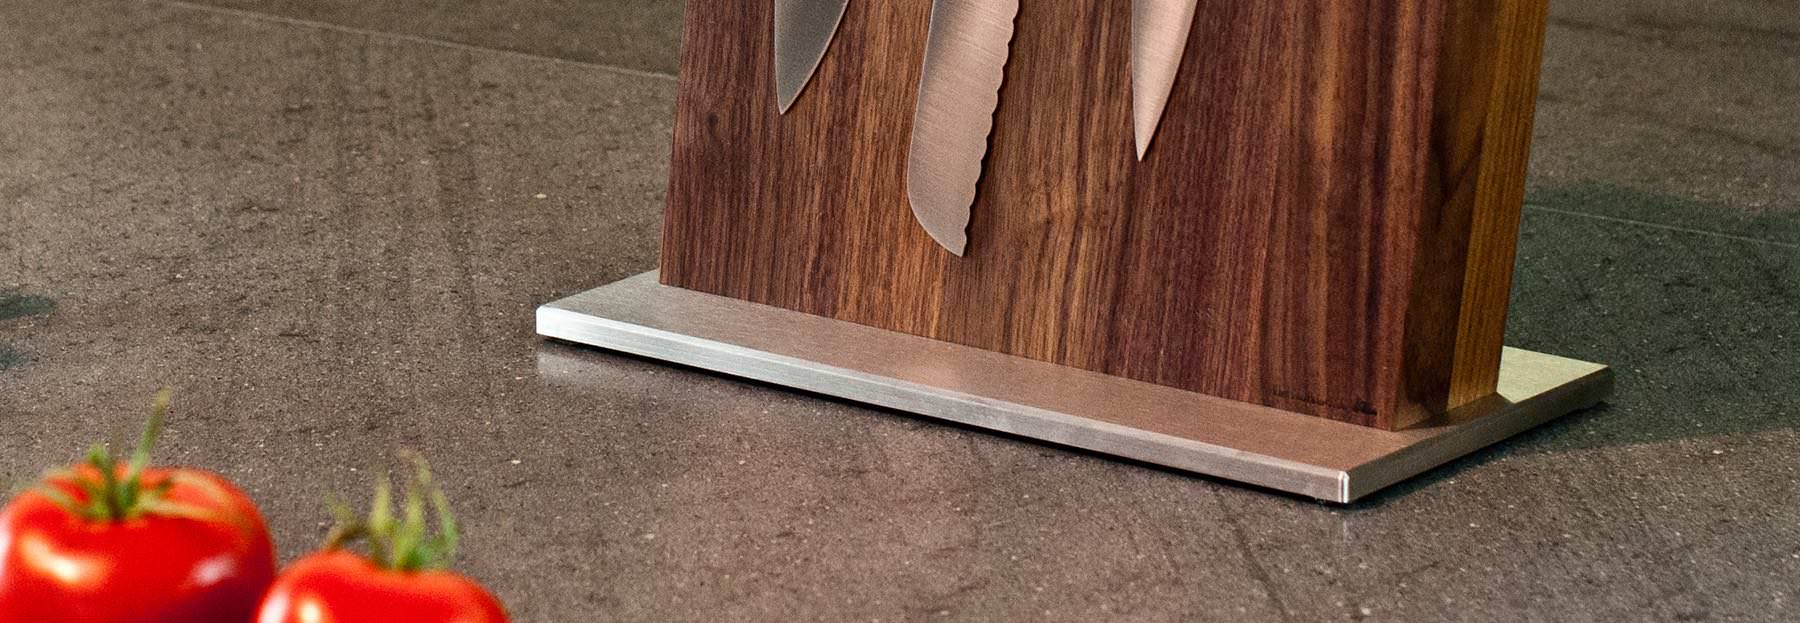 massive holzaccessoires f r die k che klotzaufklotz. Black Bedroom Furniture Sets. Home Design Ideas